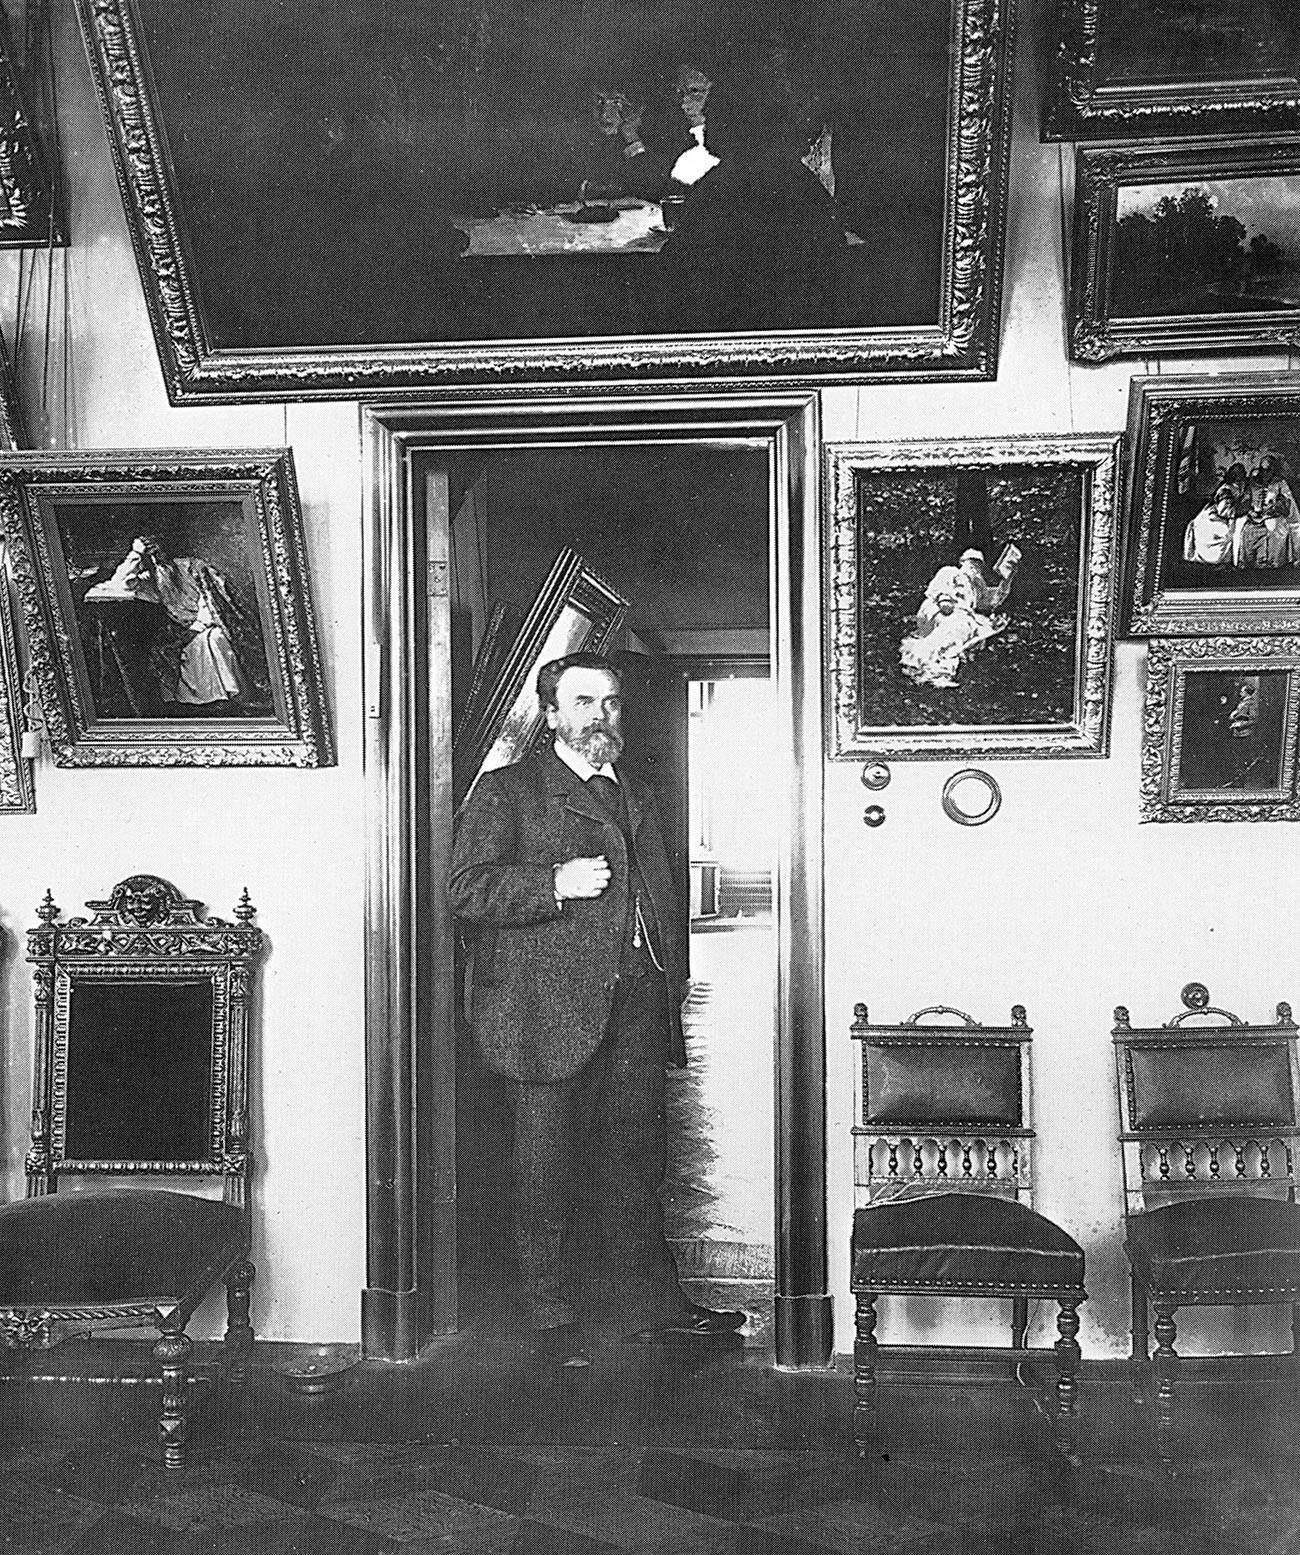 Ivan Tsvetkov em sua galeria.